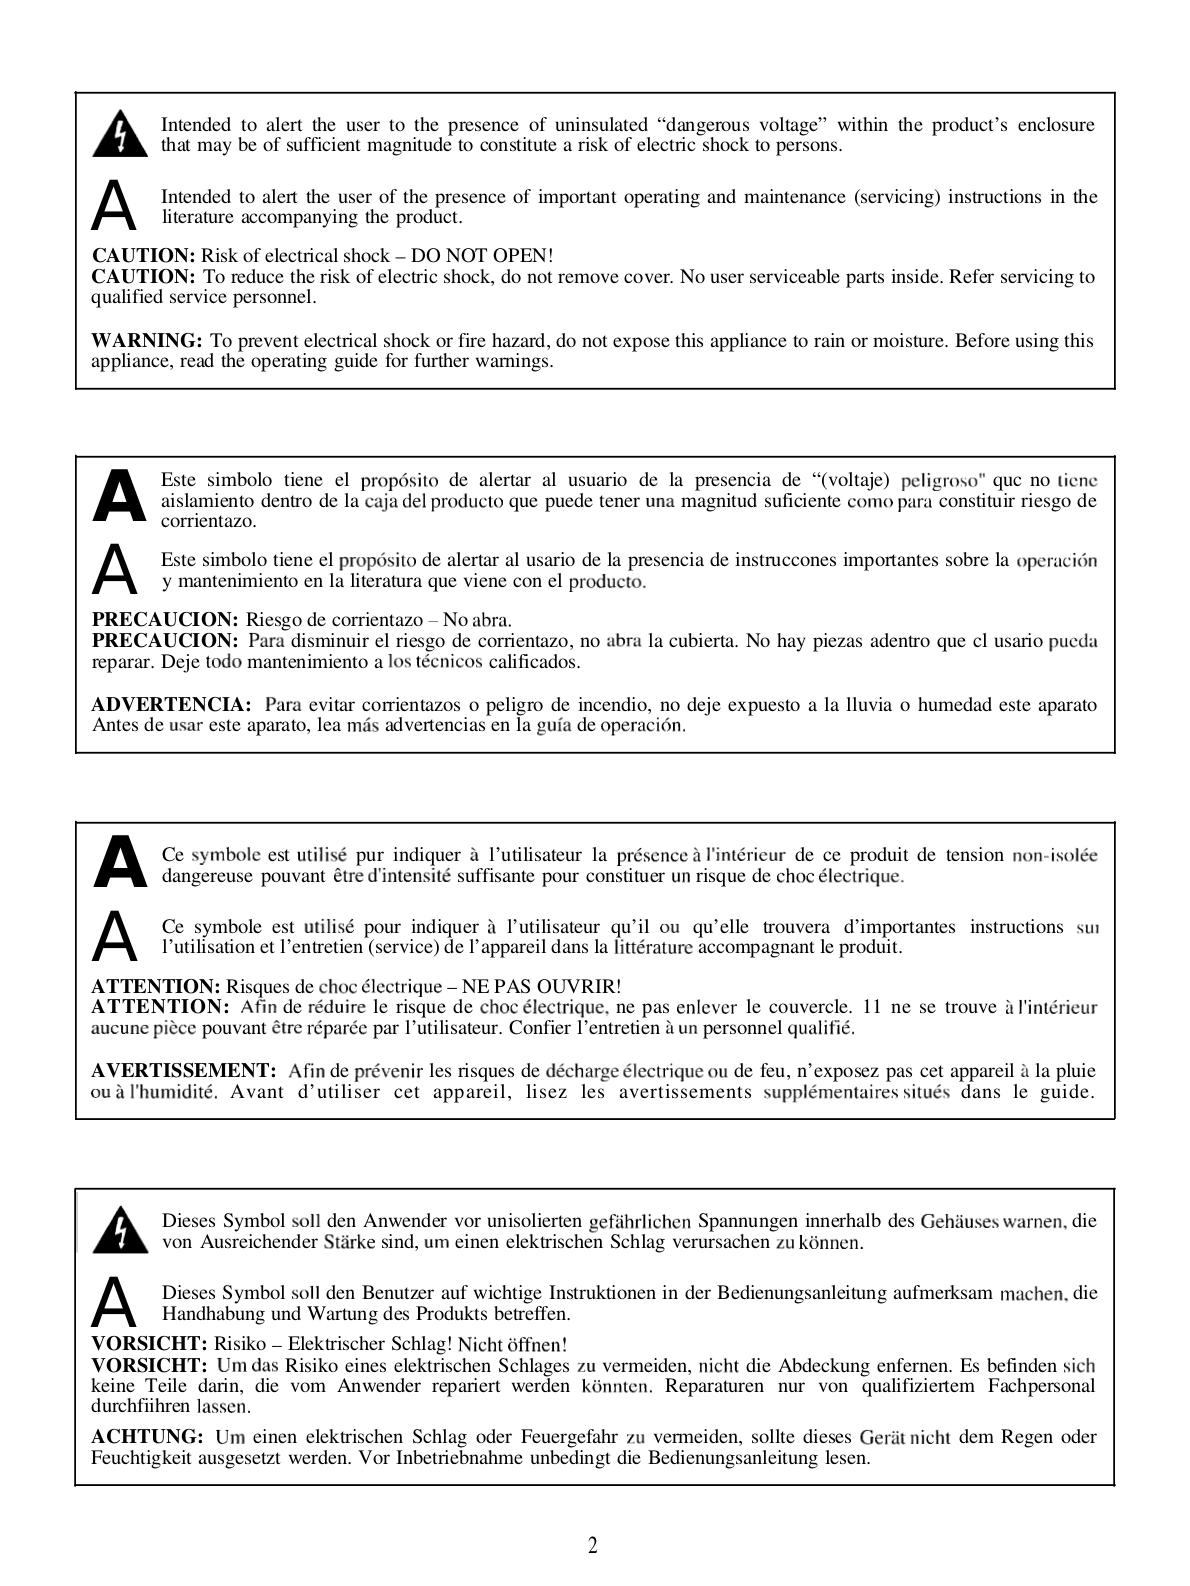 professional resume layout resume templates docs